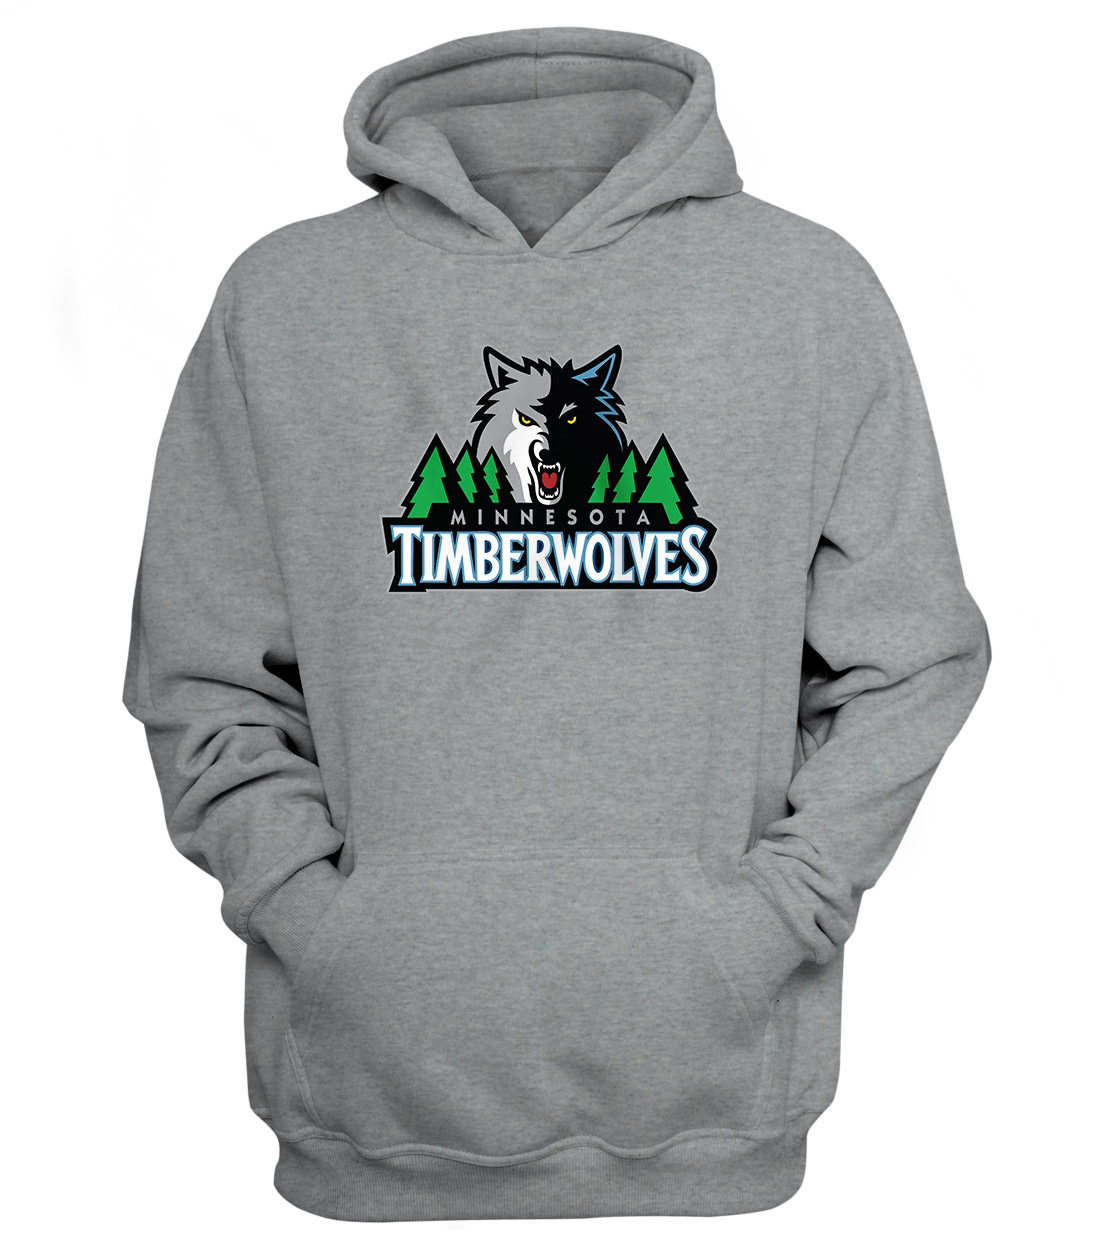 Minnesota Timberwolves Hoodie (HD-GRY-156-NBA-MIN-TIMBERWOLVES)